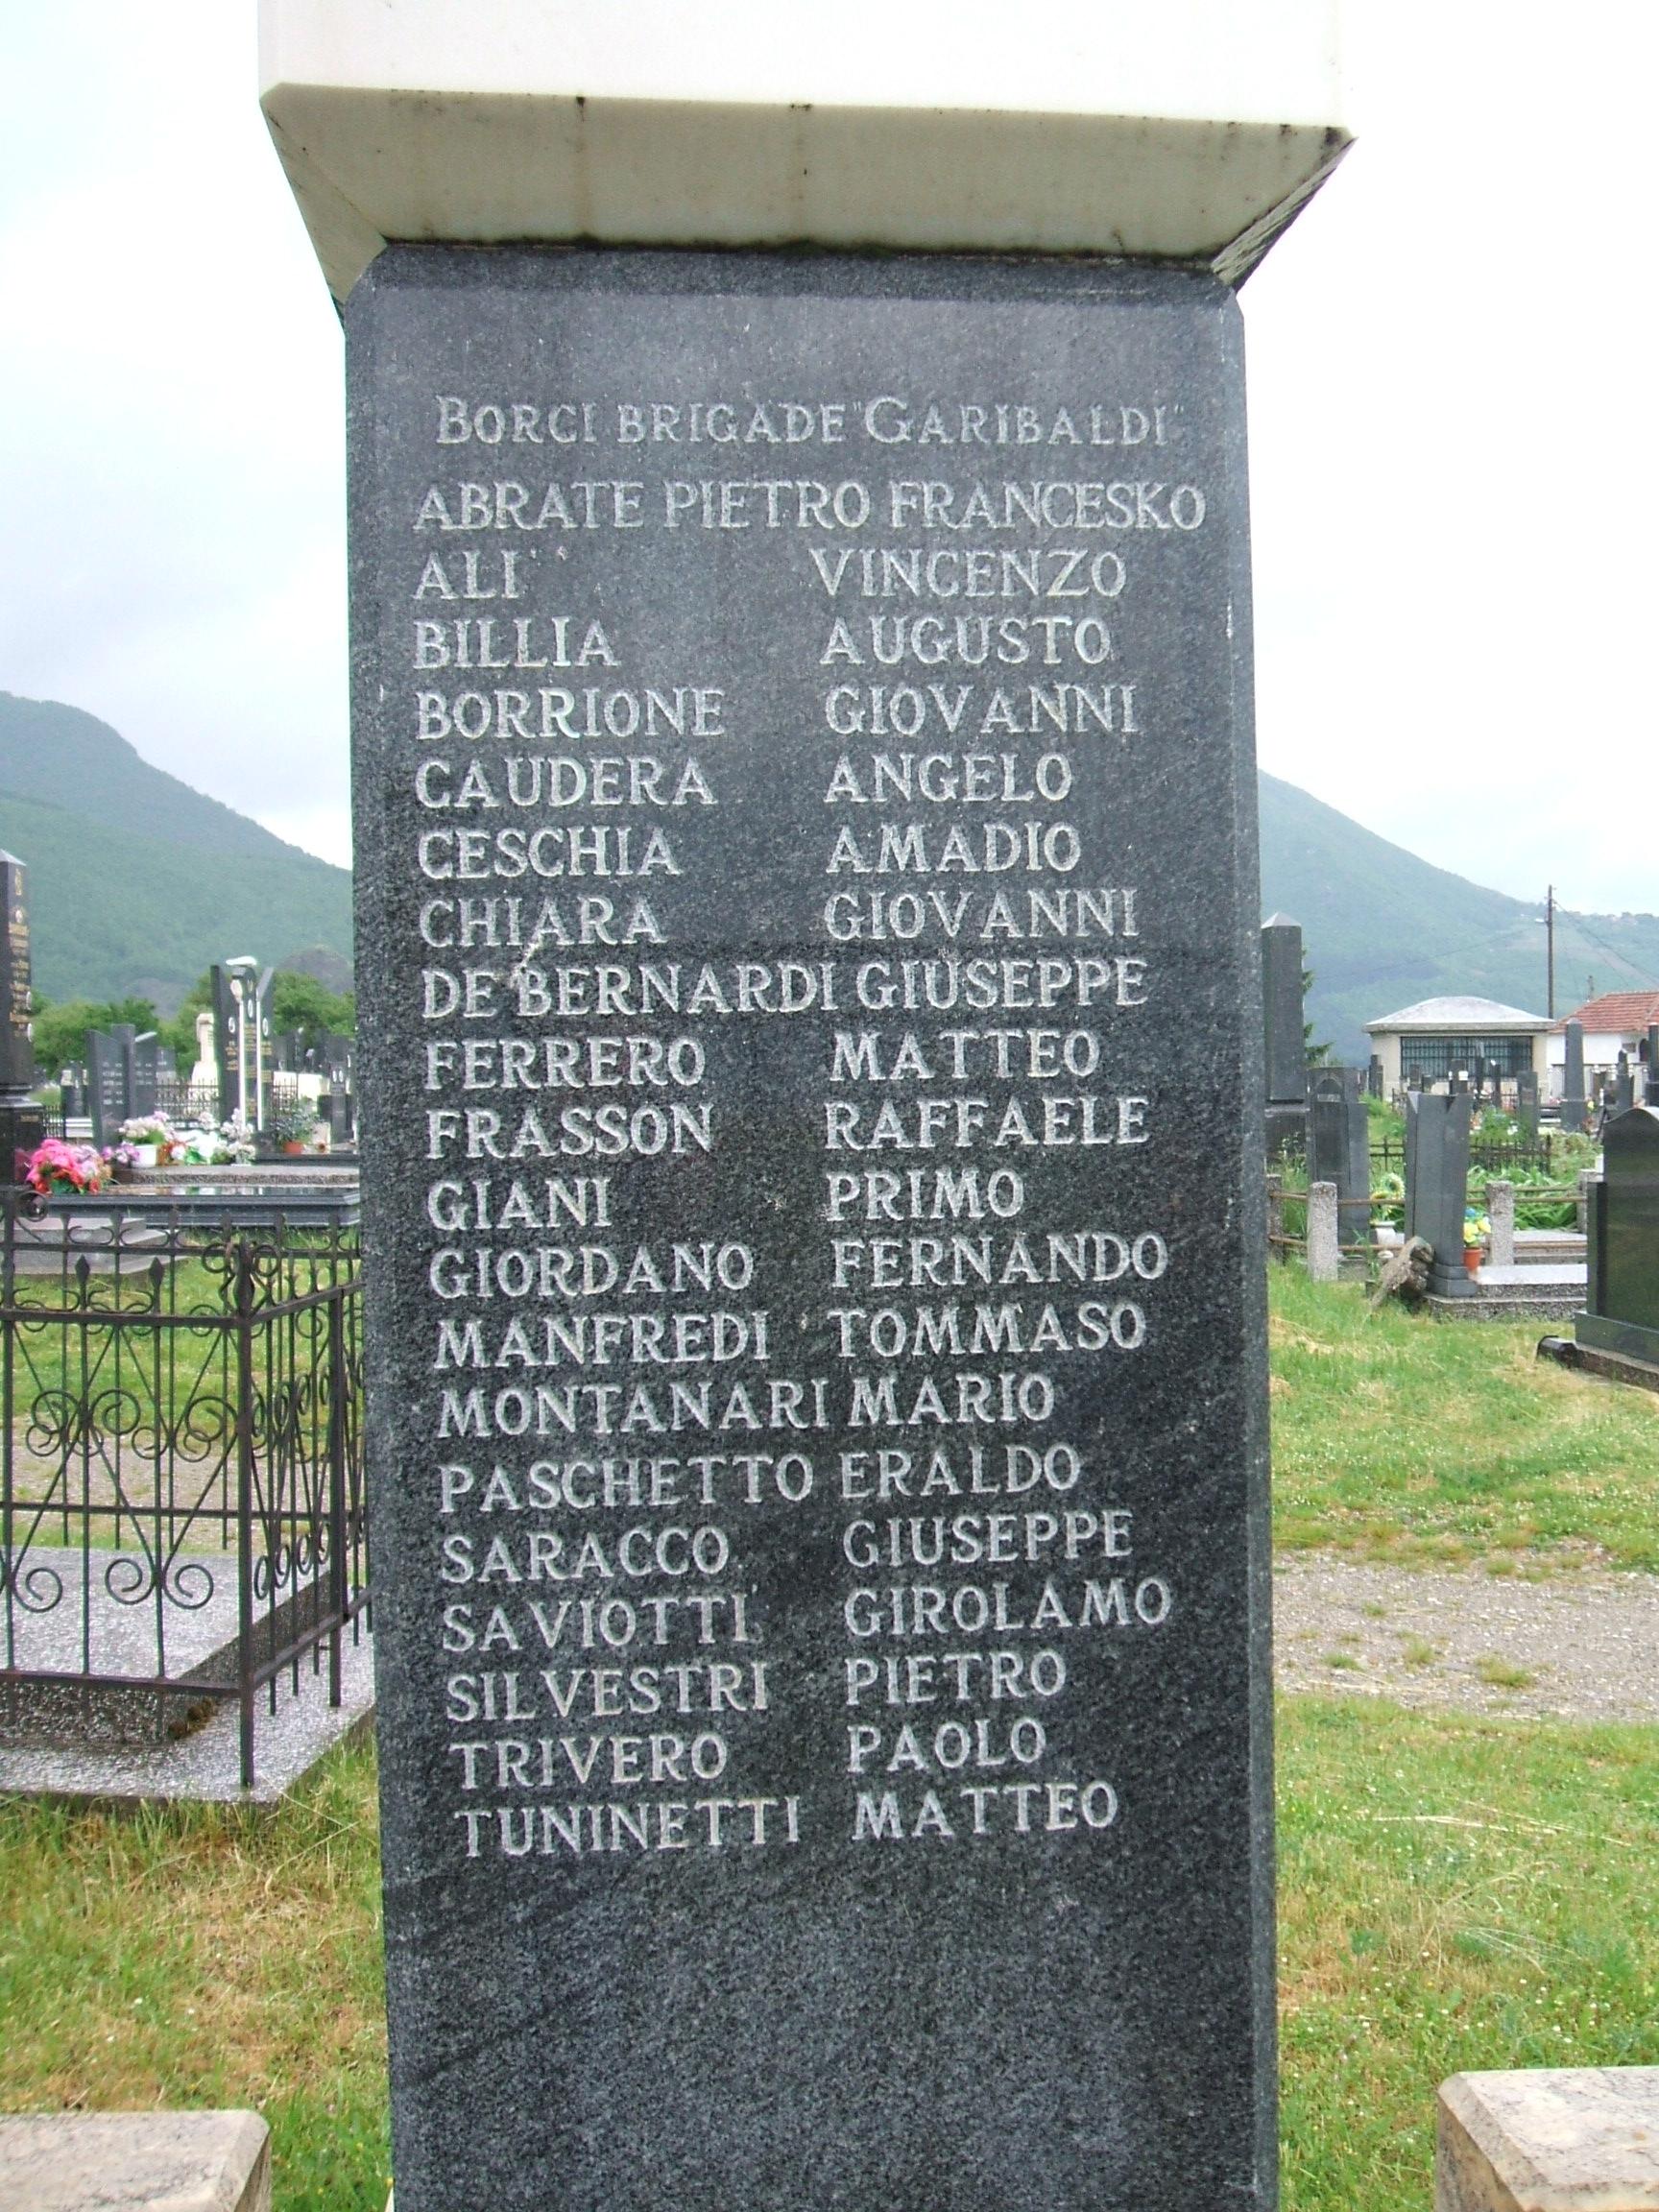 lapide commemorativa dei caduti garibaldini, Berane, Montenegro